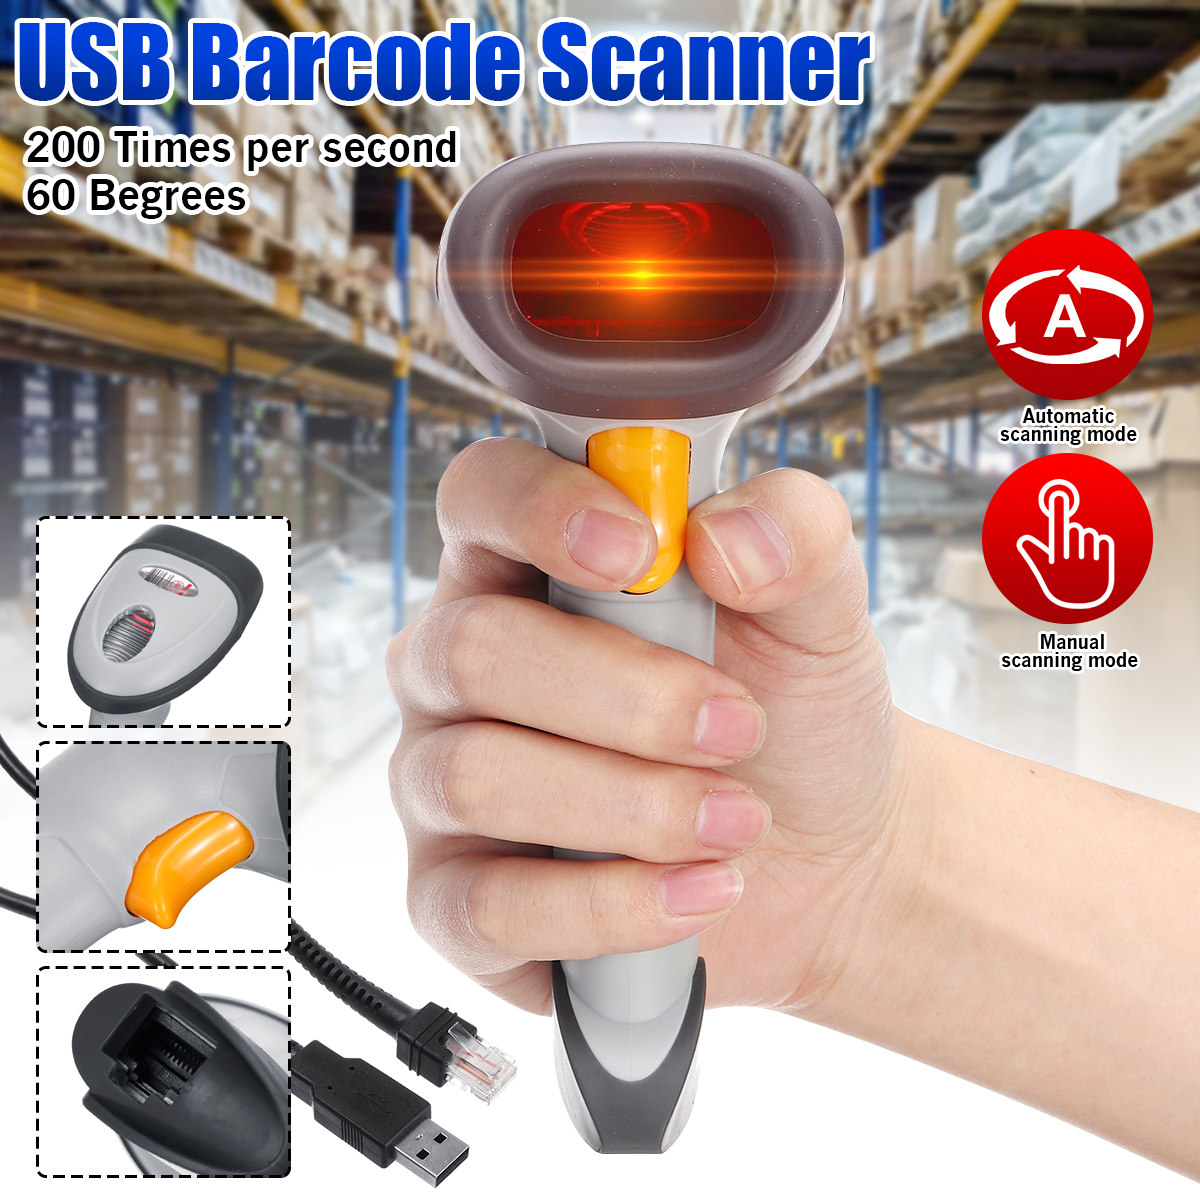 USB ความเร็วสูงอัตโนมัติ Barcode Scanner จัดการ 1D สายบาร์โค้ดเลเซอร์สแกนเนอร์-ใน เครื่องสแกน จาก คอมพิวเตอร์และออฟฟิศ บน Alidwantop Technology CO., LTD